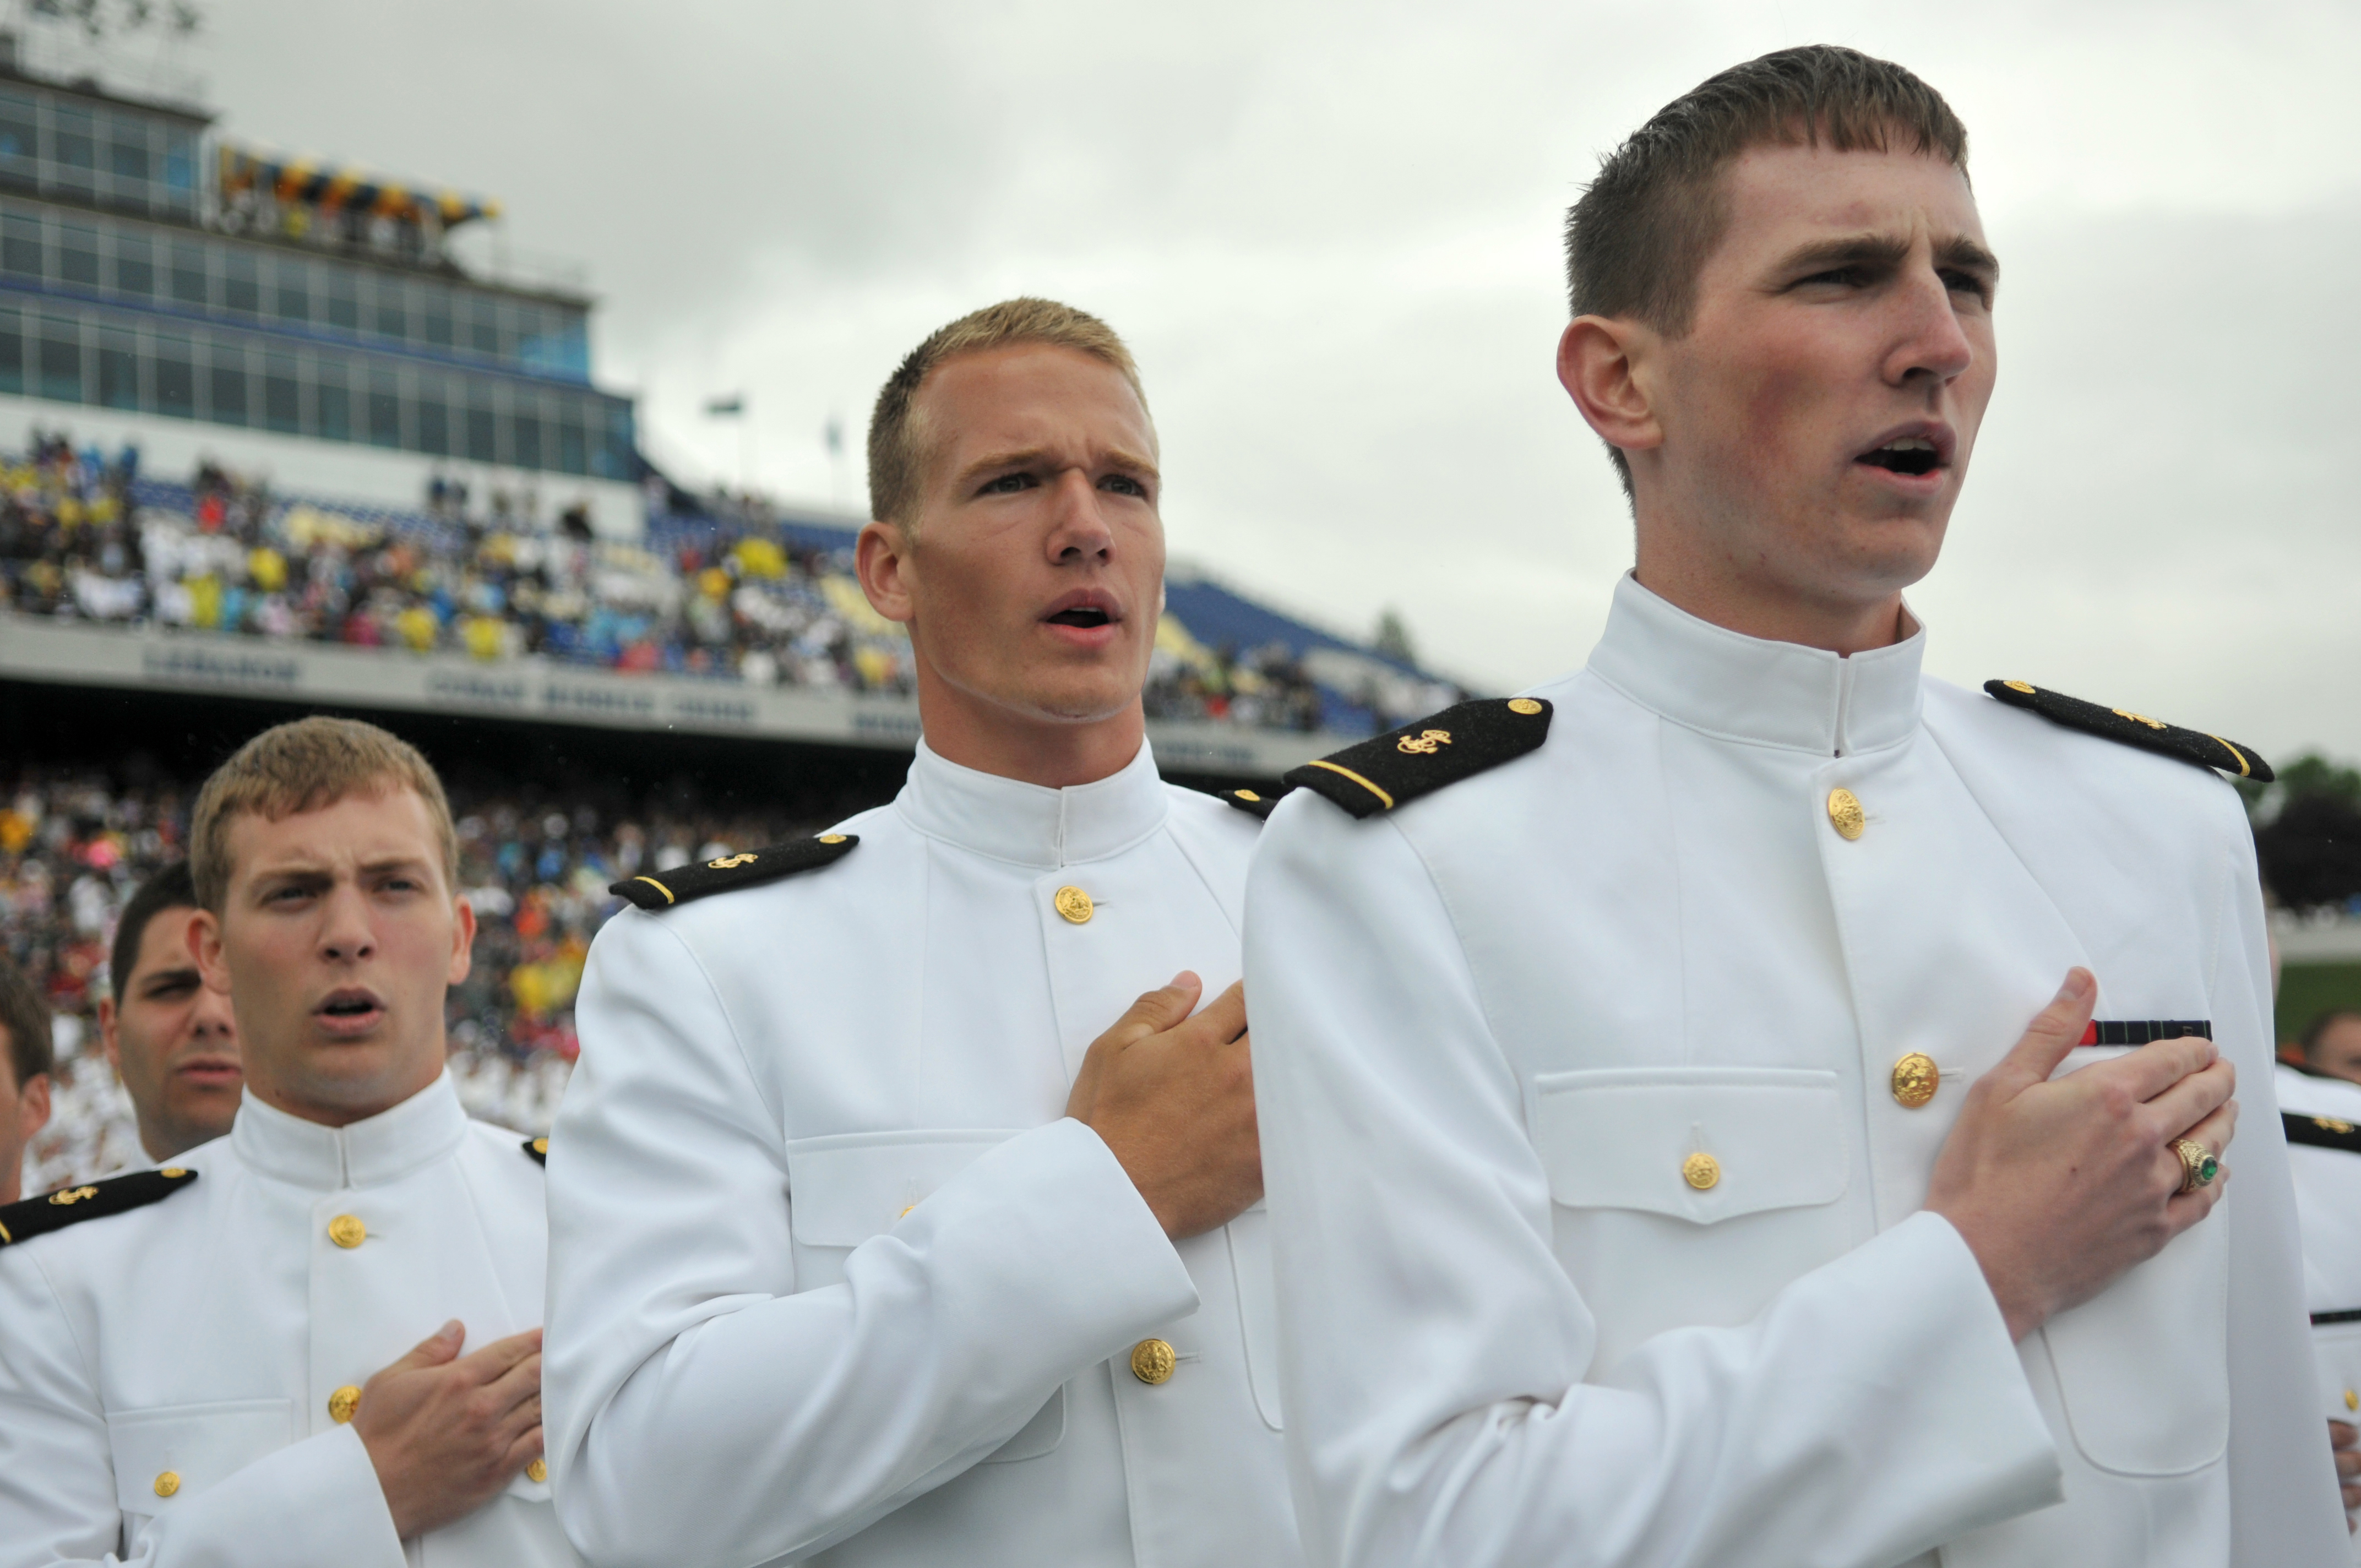 Navy Graduation Dates for 2013